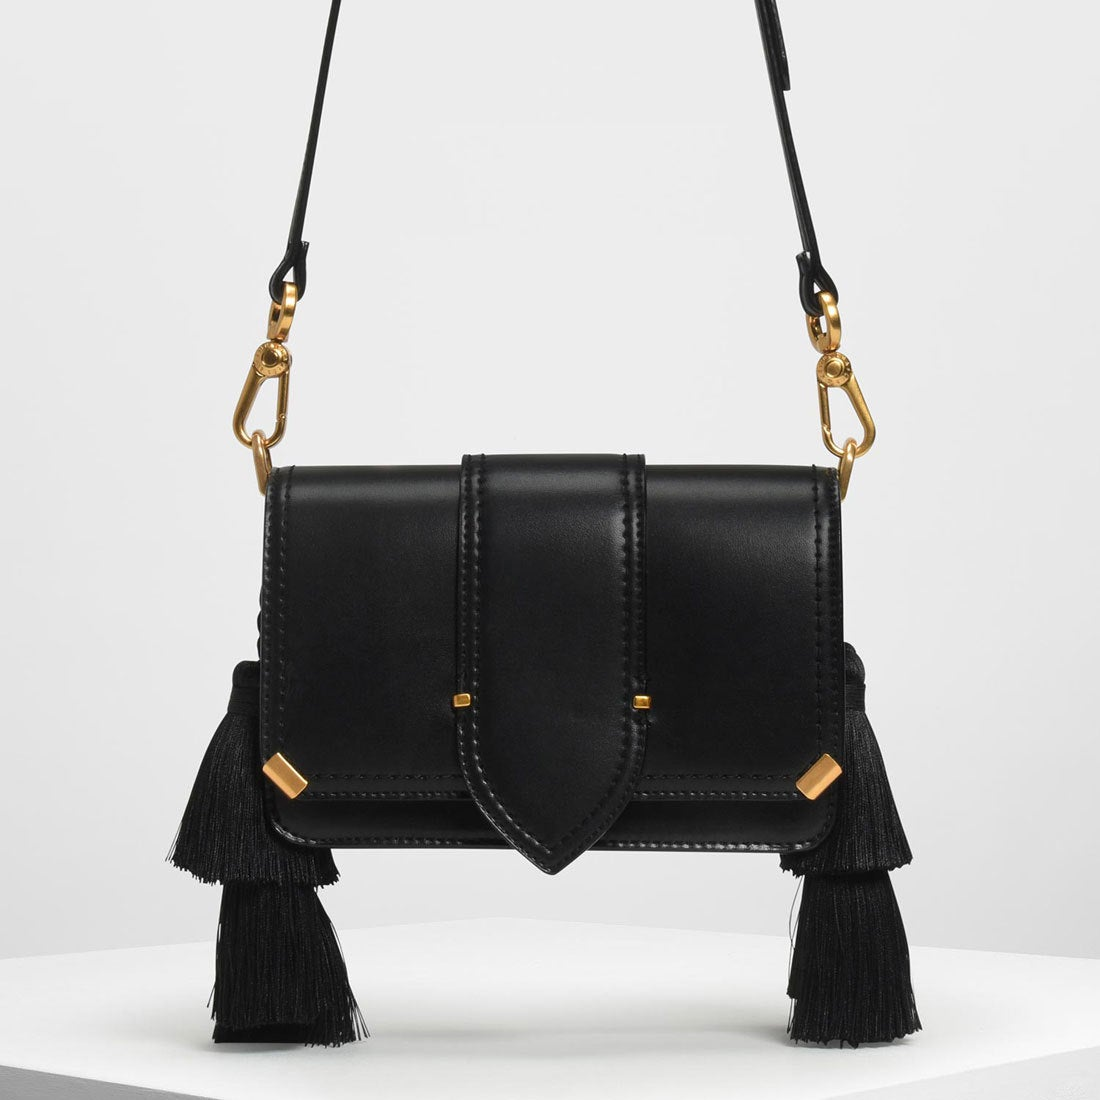 425ec90ca599 CHARLES & KEITH タッセルショルダーバッグ / Tassel Shoulder Bag (Black)-CHARLES &  KEITH公式オンラインストア